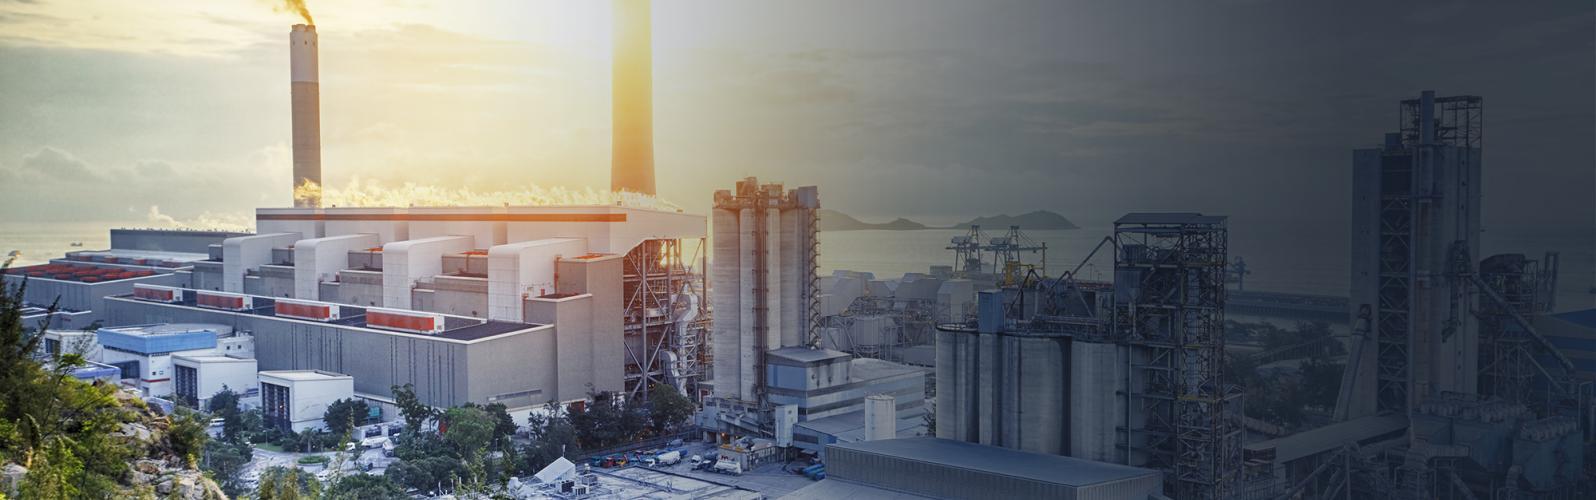 Proveedor de bombas volumétricas para la industria petrolera, alimentaria e industriale